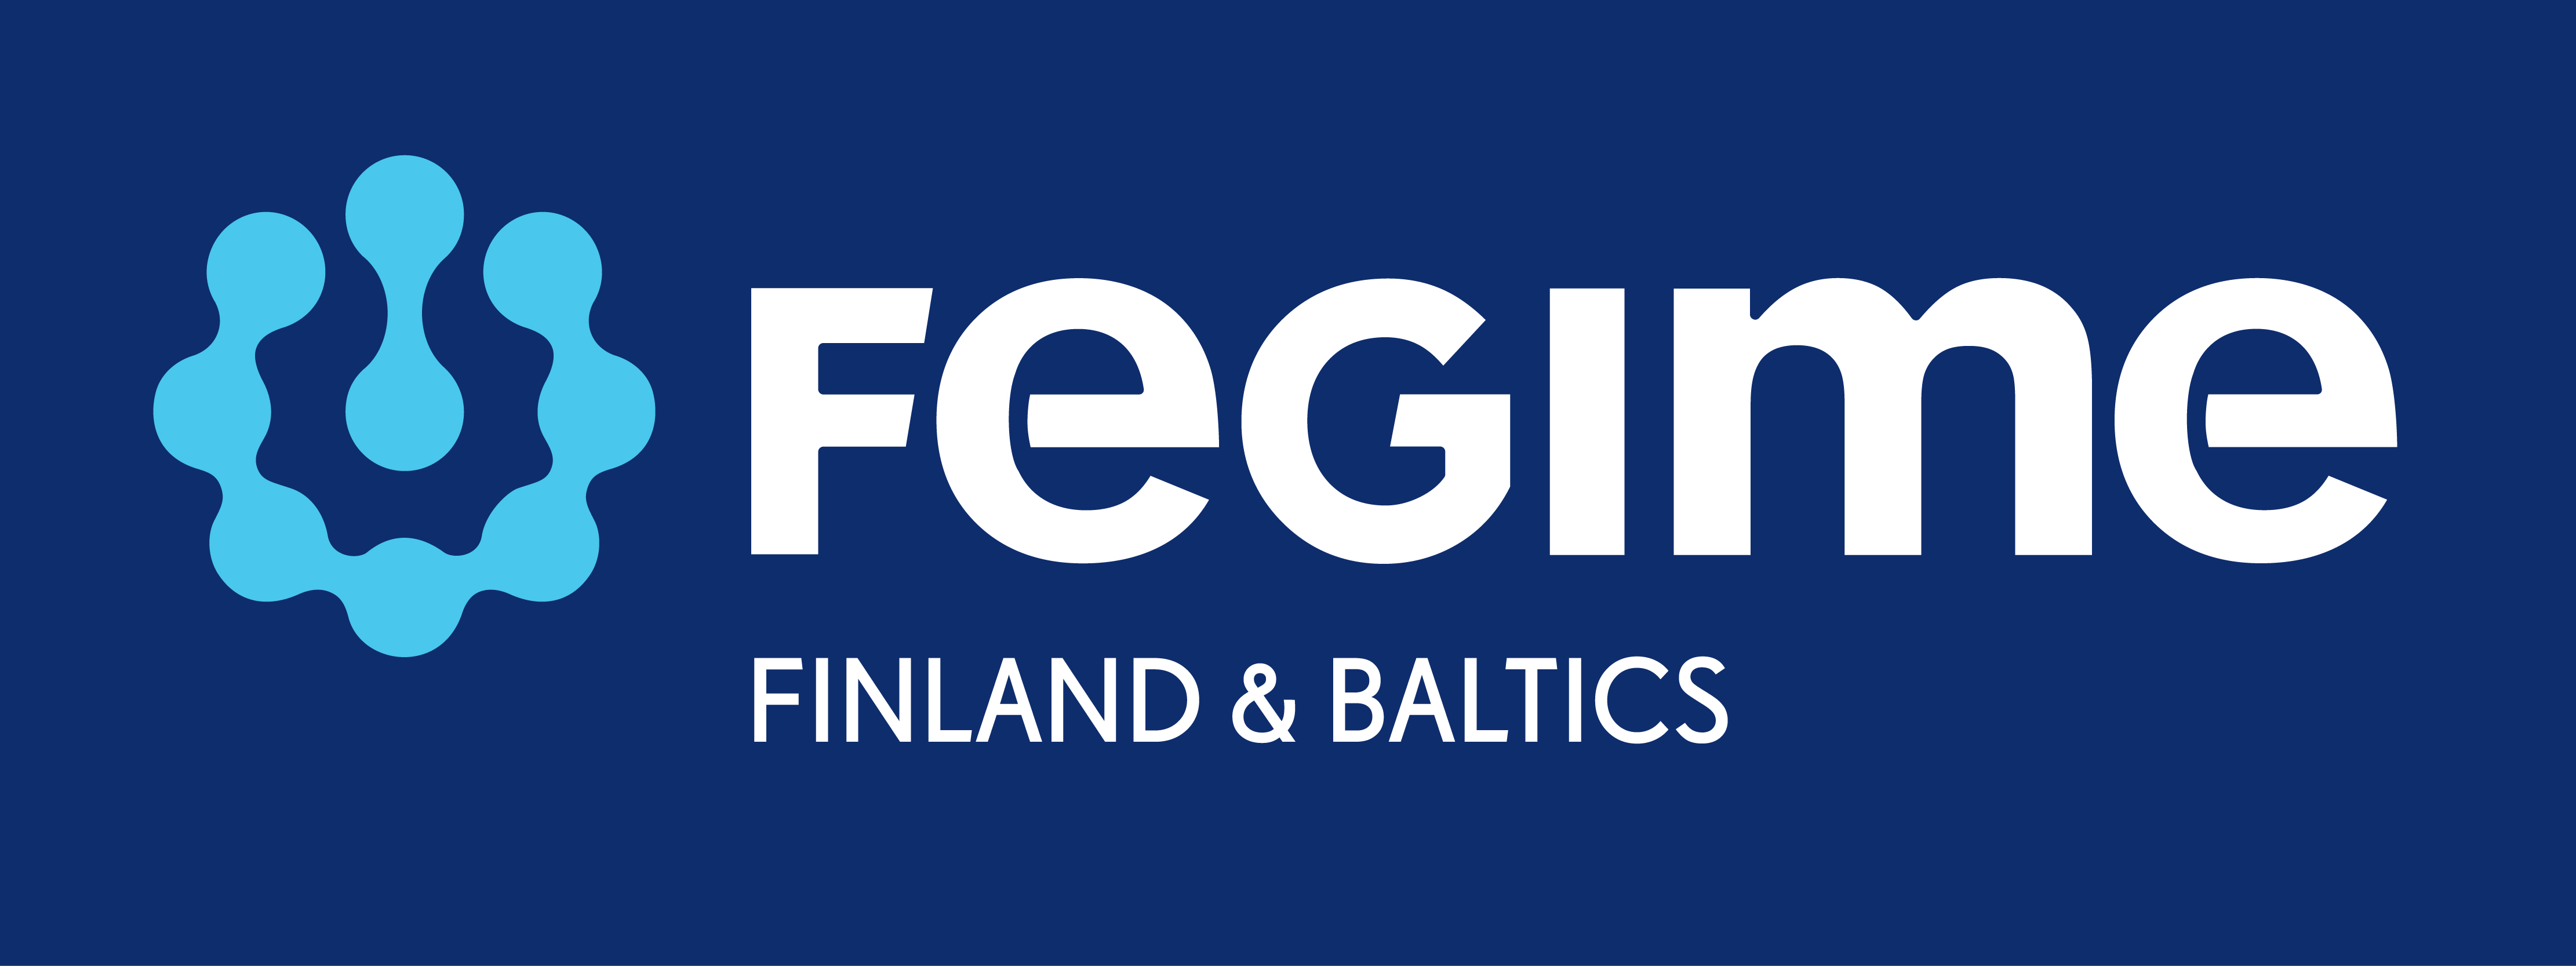 Lg FEGIME FI Neg2 RGB